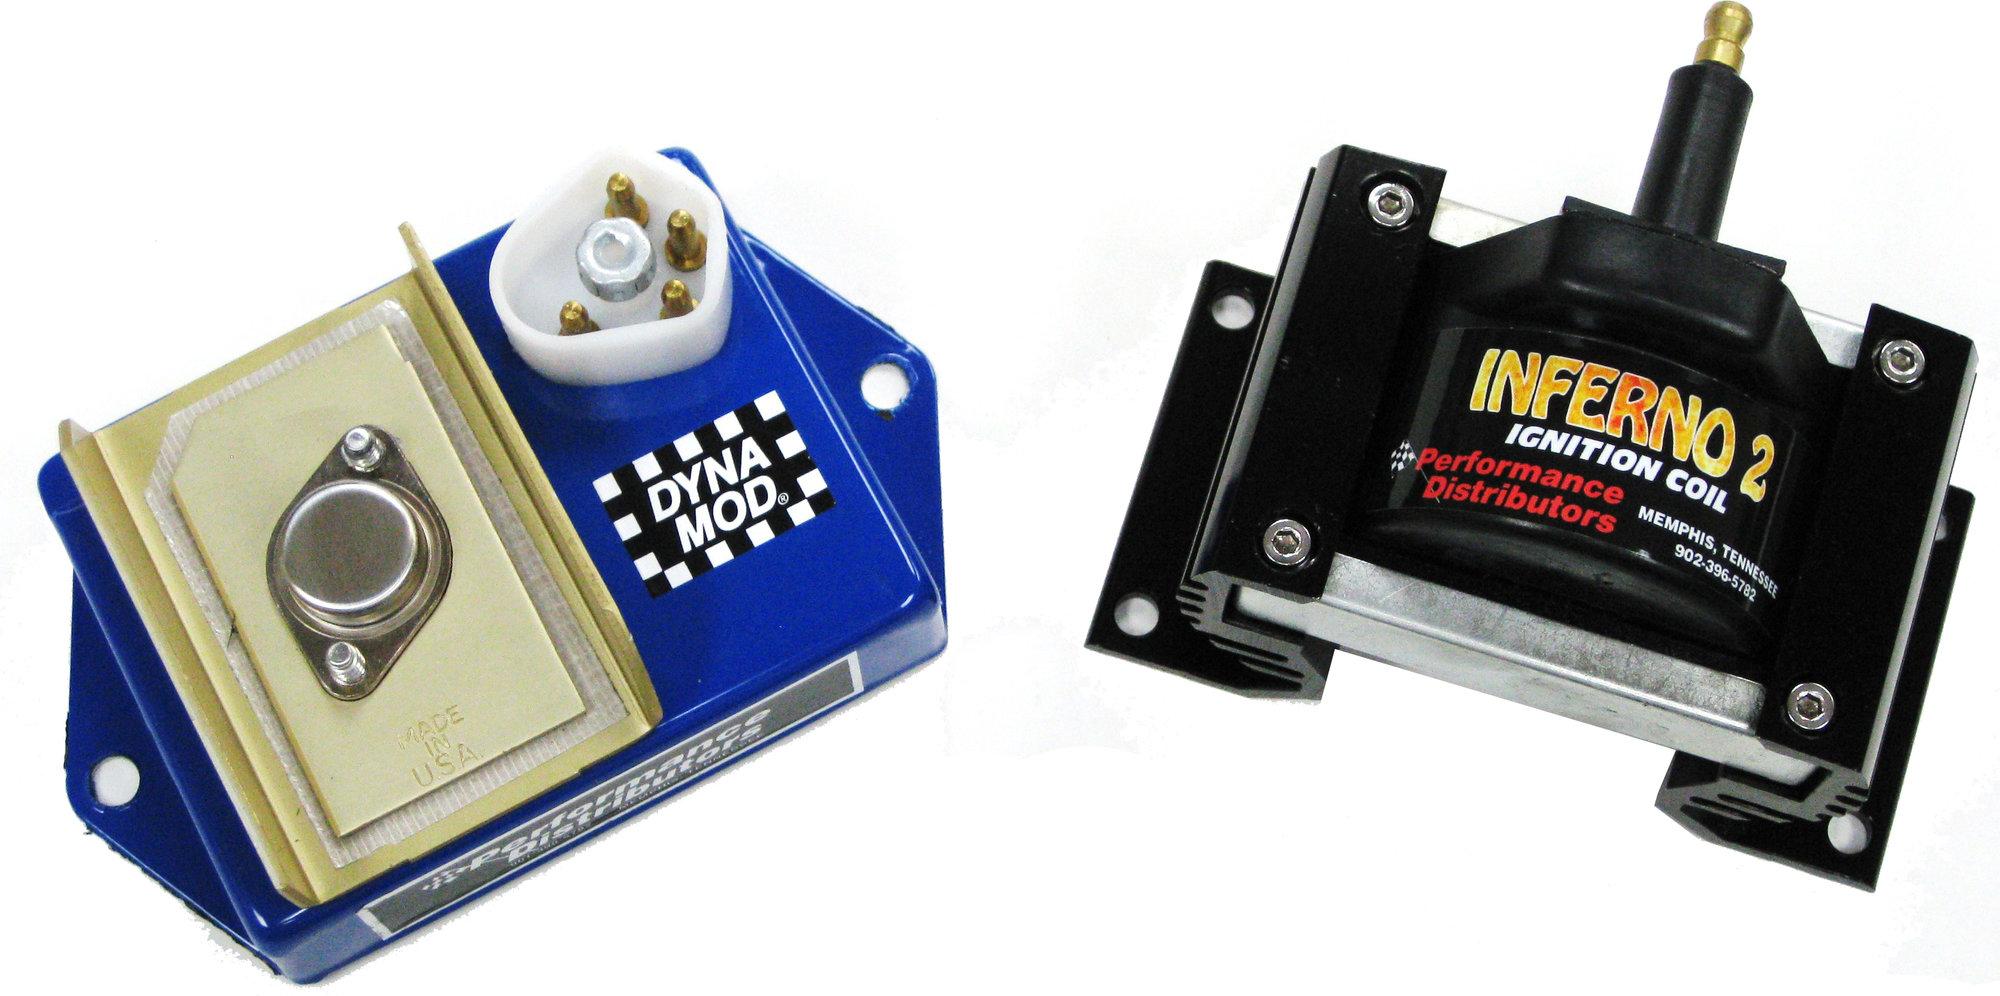 ford duraspark ignition 2000 pontiac grand am gt wiring diagram performance distributors 31721 dyna module and inferno 2